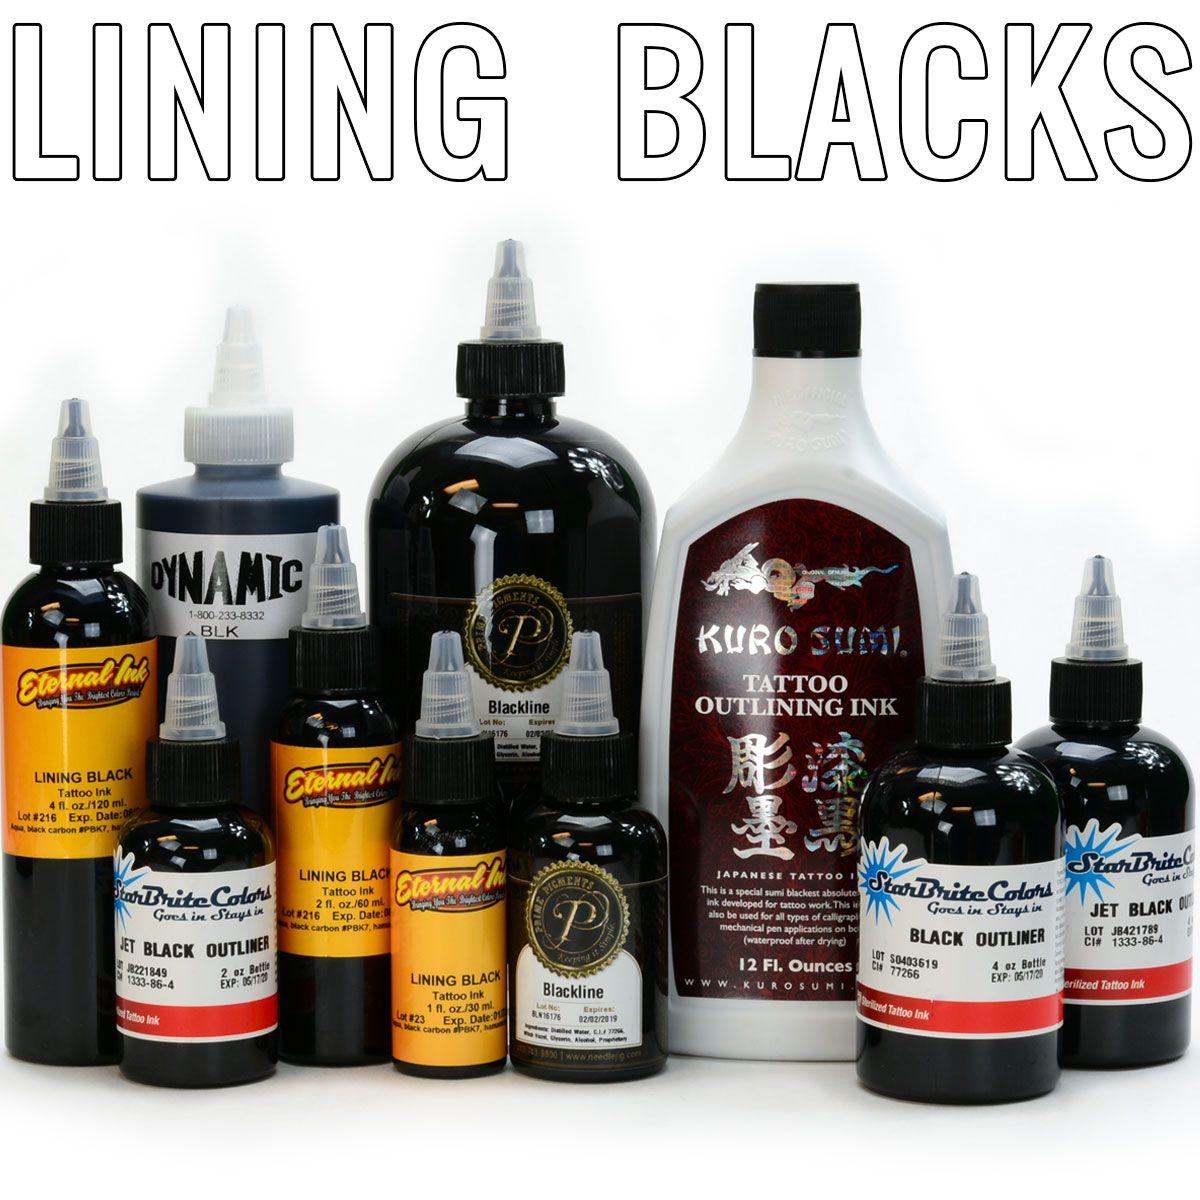 Lining B L A C K S Only The Best Black Inks On The Market Blackline Eternalink Fusionink Startbrite Kurus Ink Tattoo Marquesan Tattoos Tattoo Shop Decor